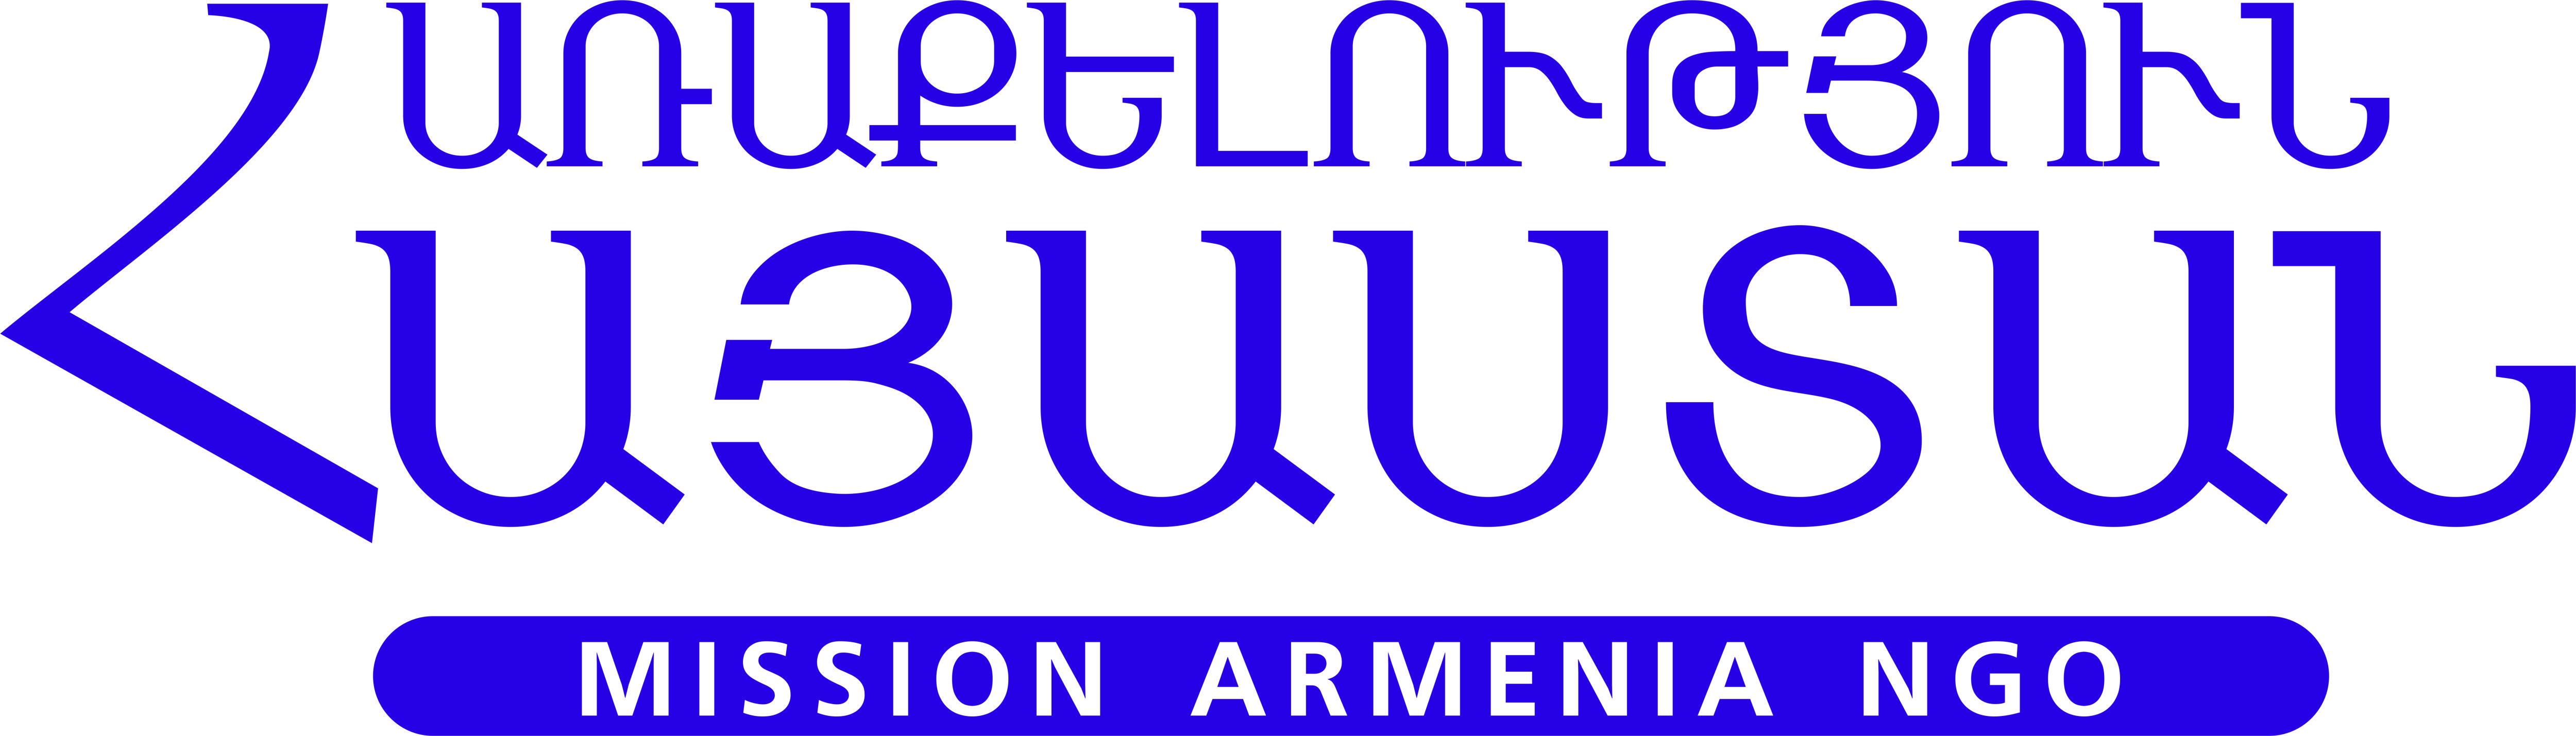 Mission Armenia NGO